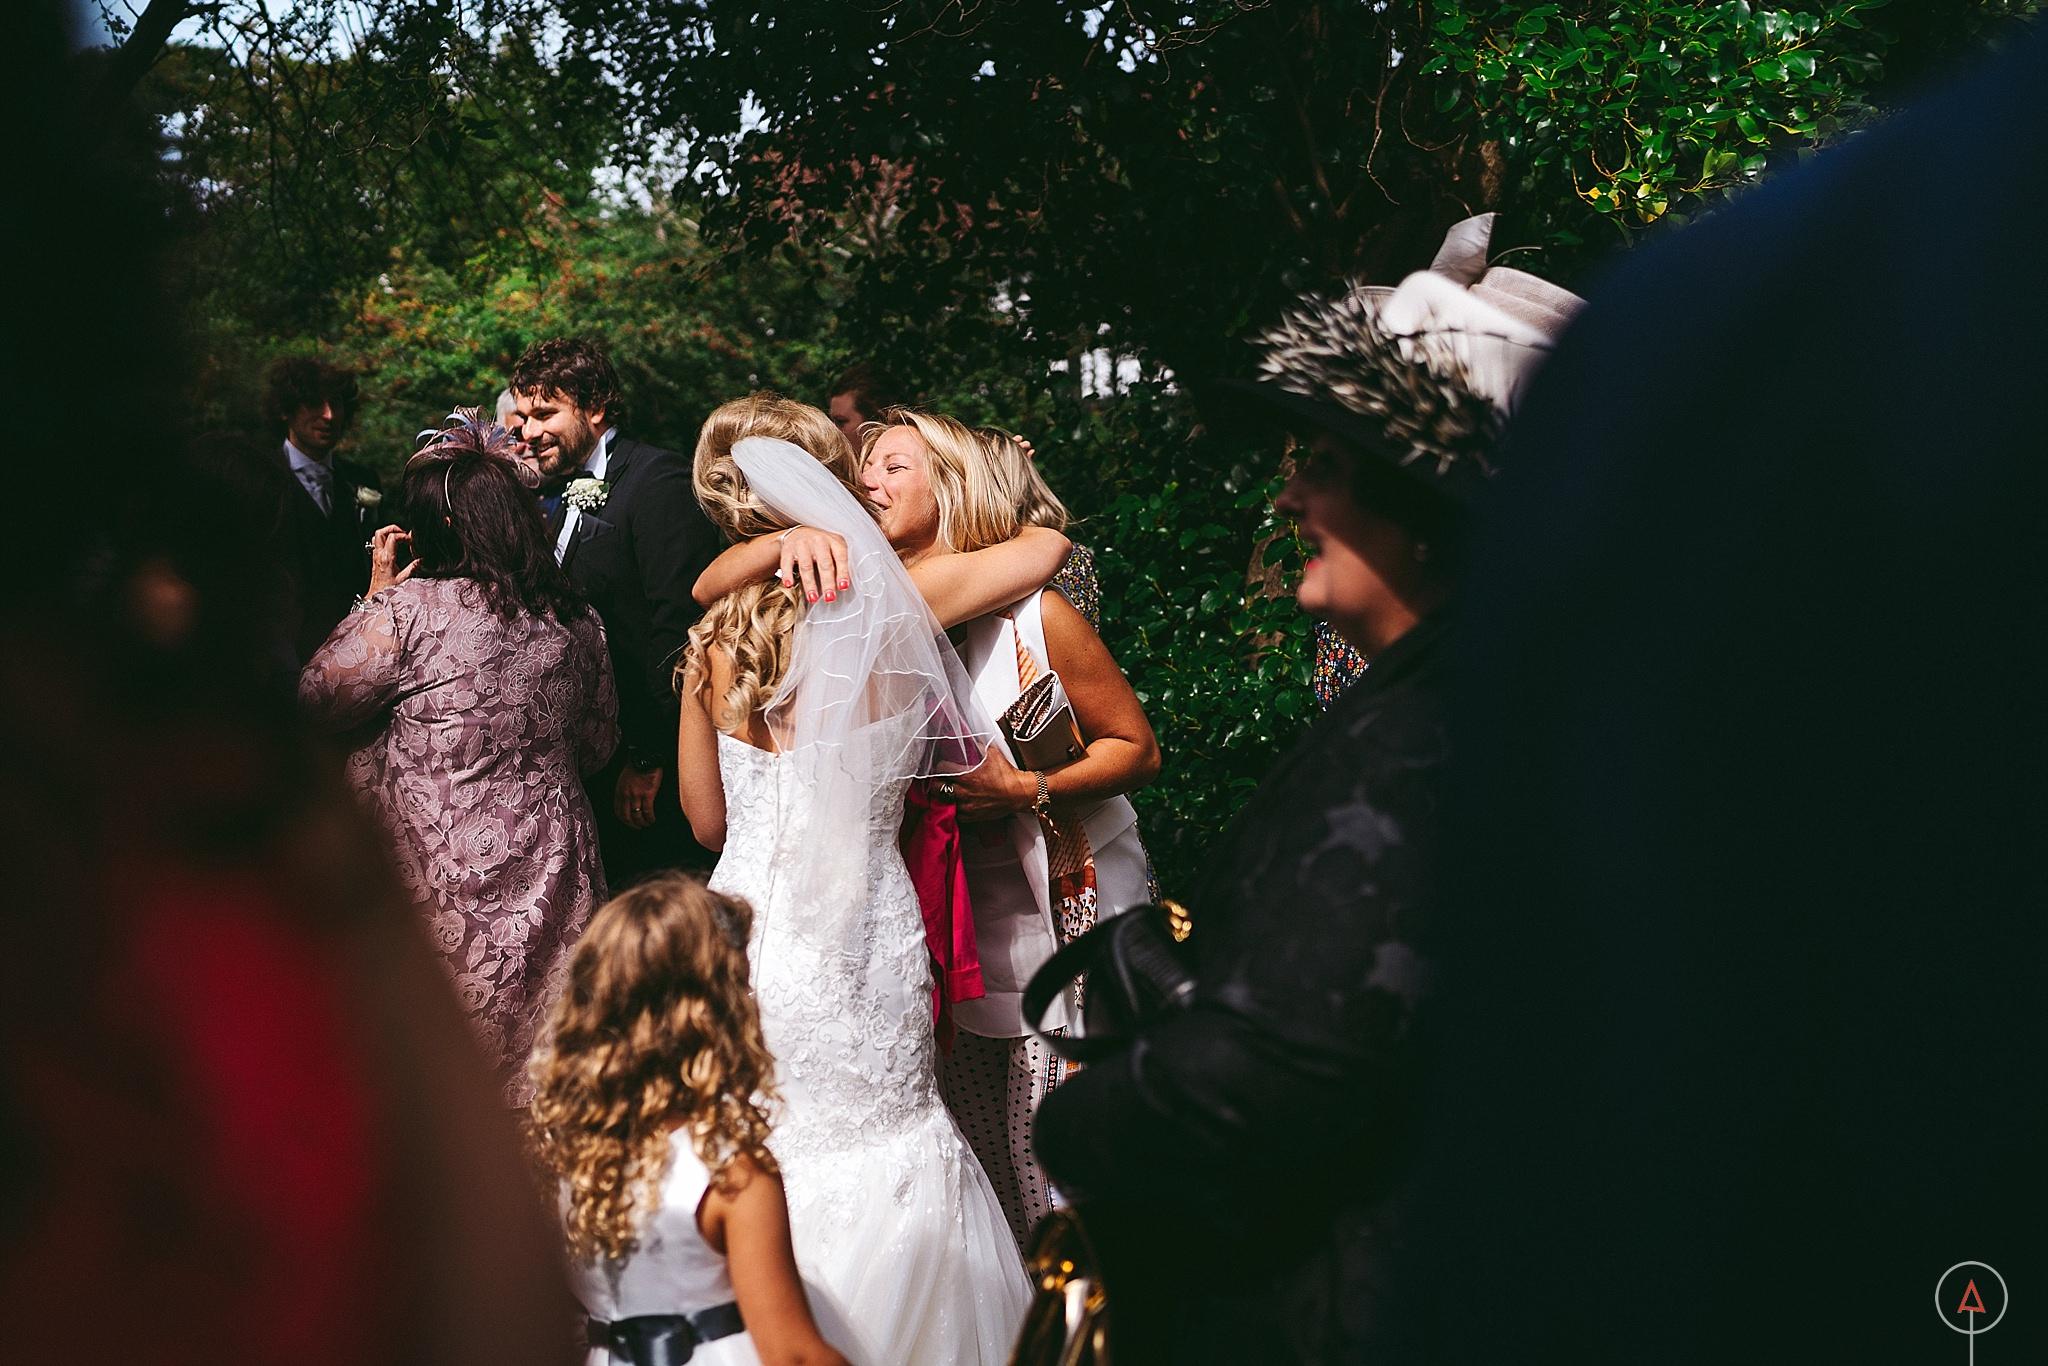 cardiff-wedding-photographer-aga-tomaszek_0370